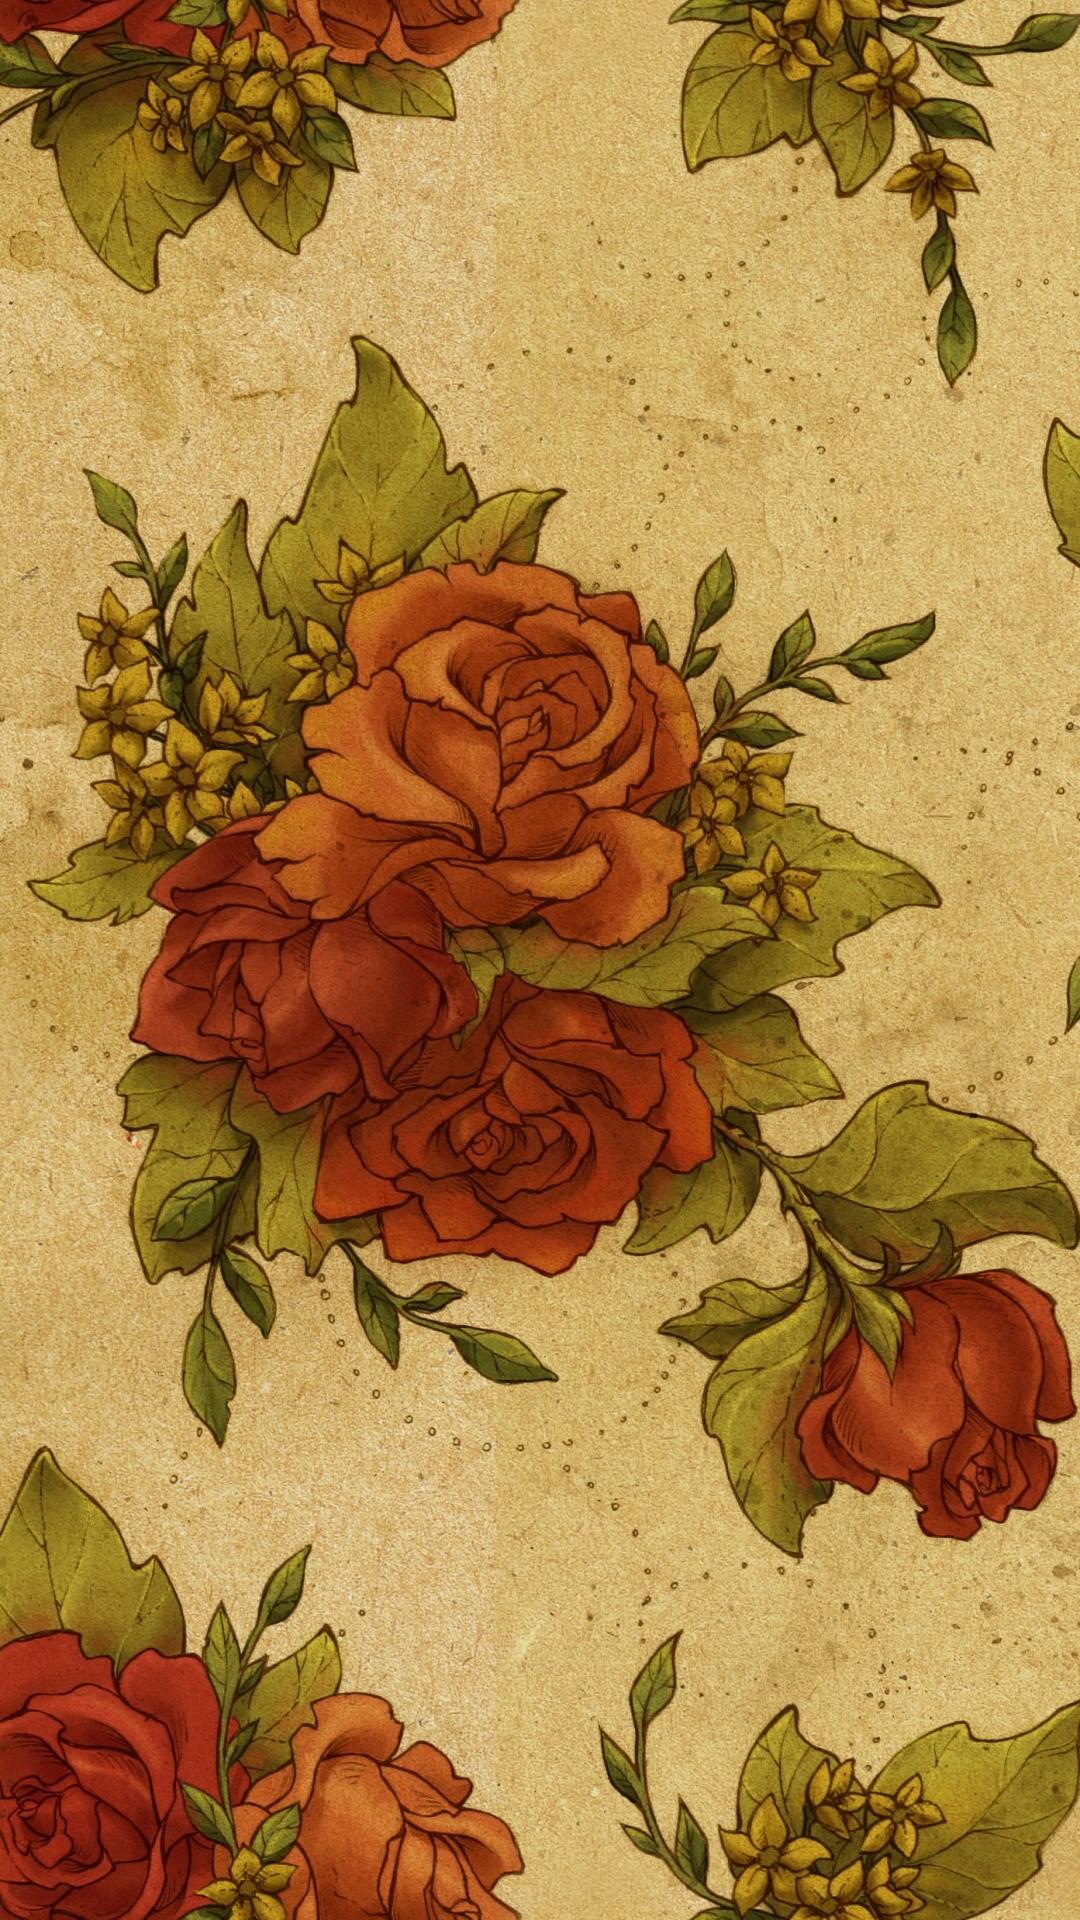 Retro wallpaper for iPhone